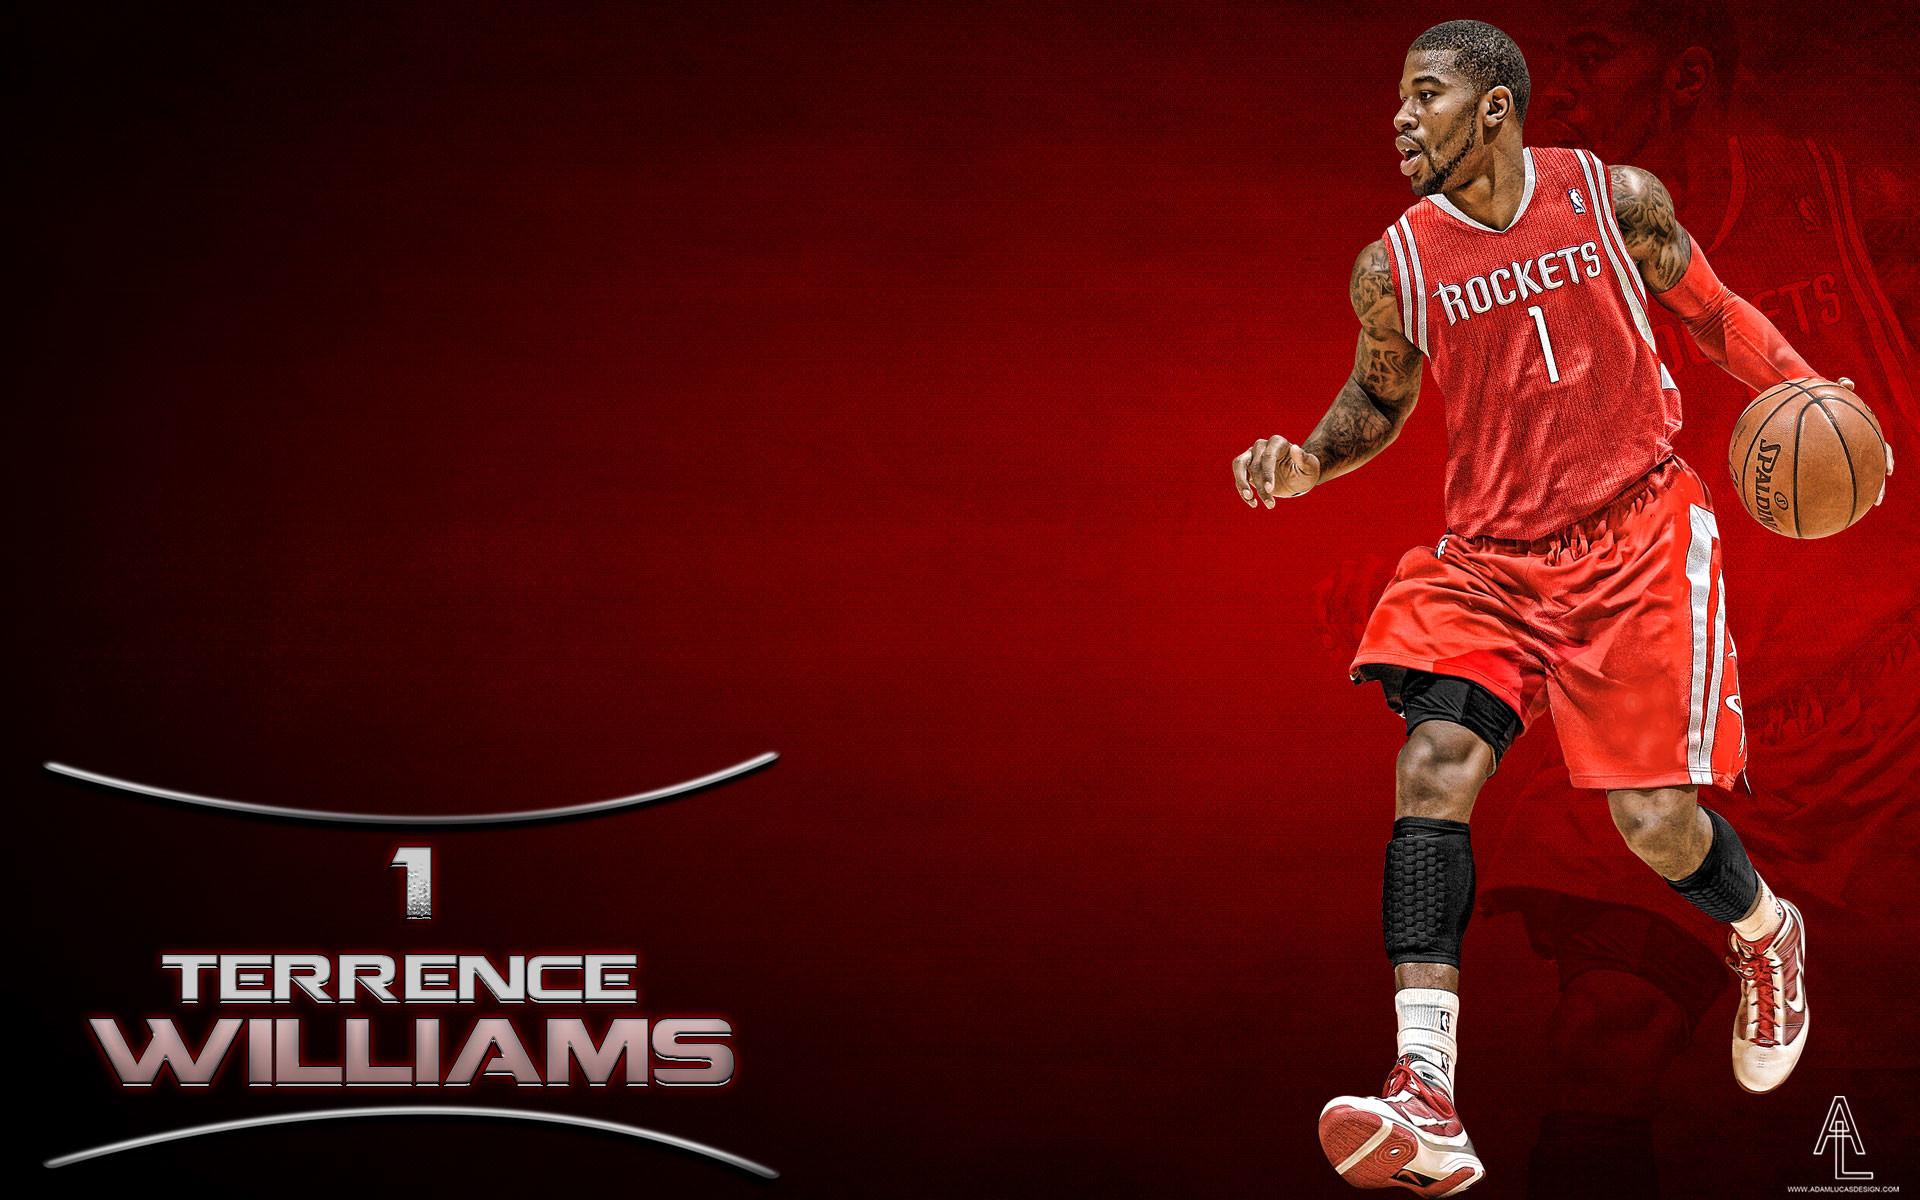 Terrence Williams Rockets Widescreen Wallpaper